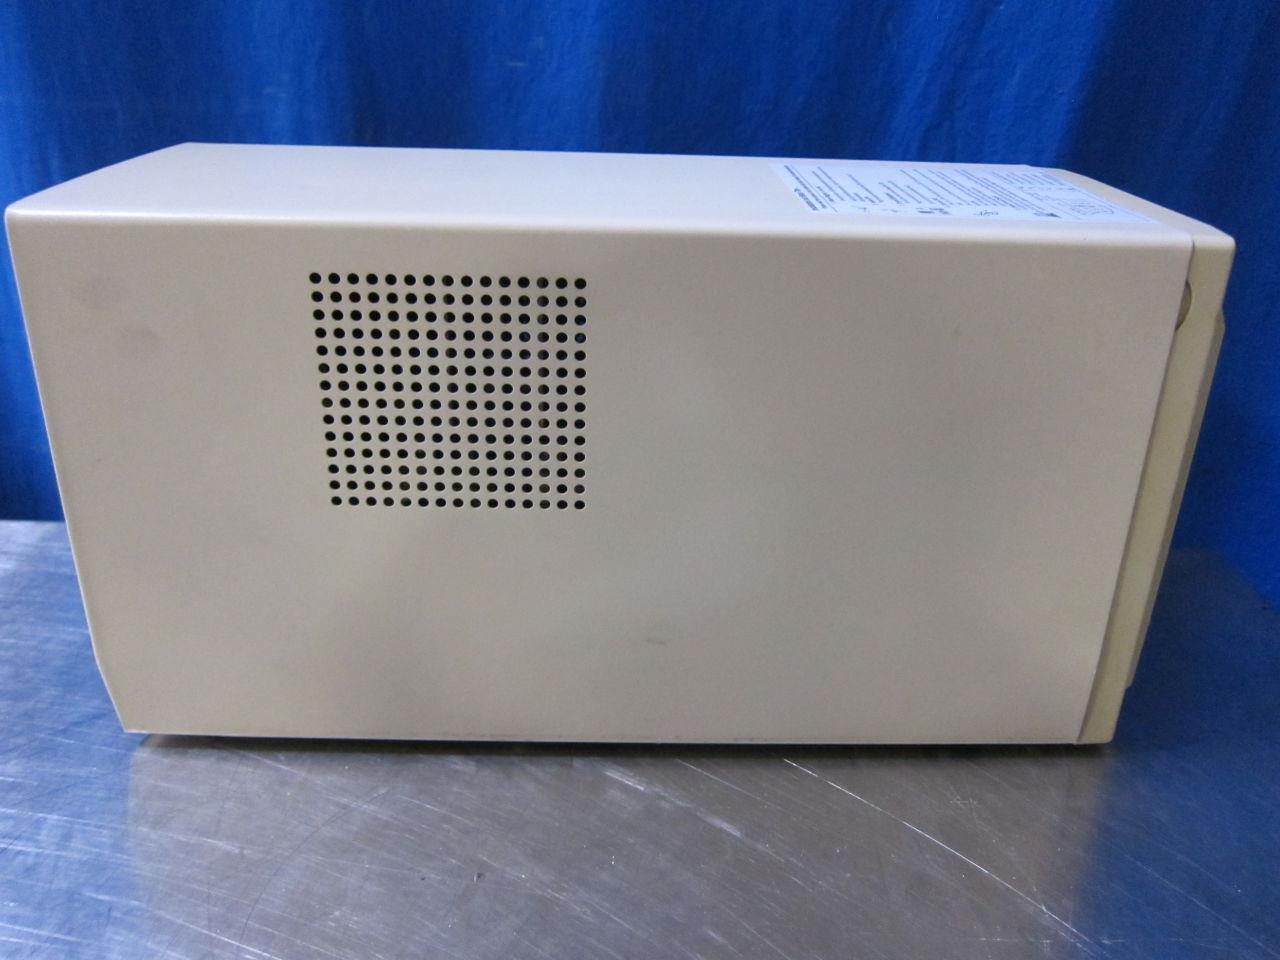 APC Smart UPS 1000 Uninterruptible Power Supply / UPS